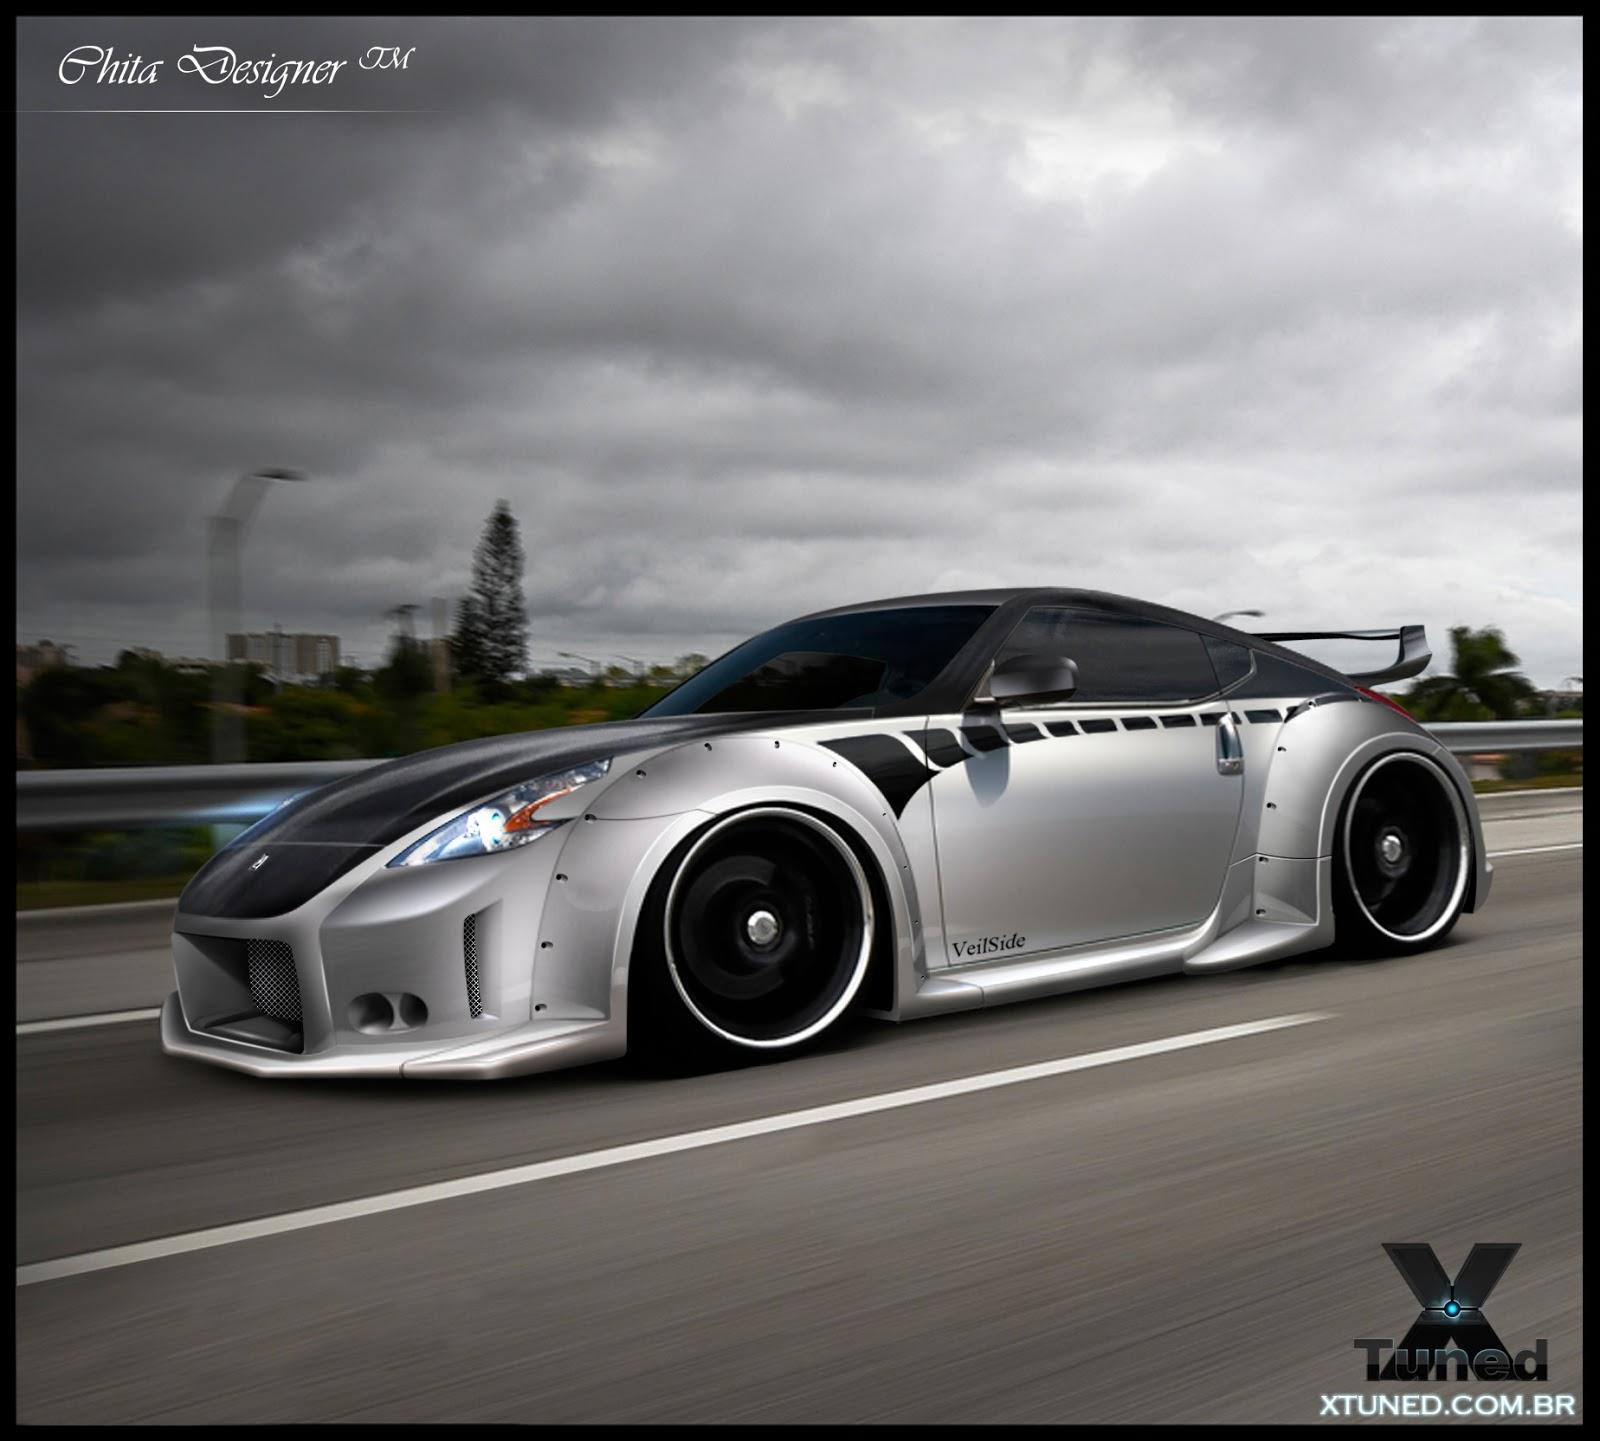 Veilside Car